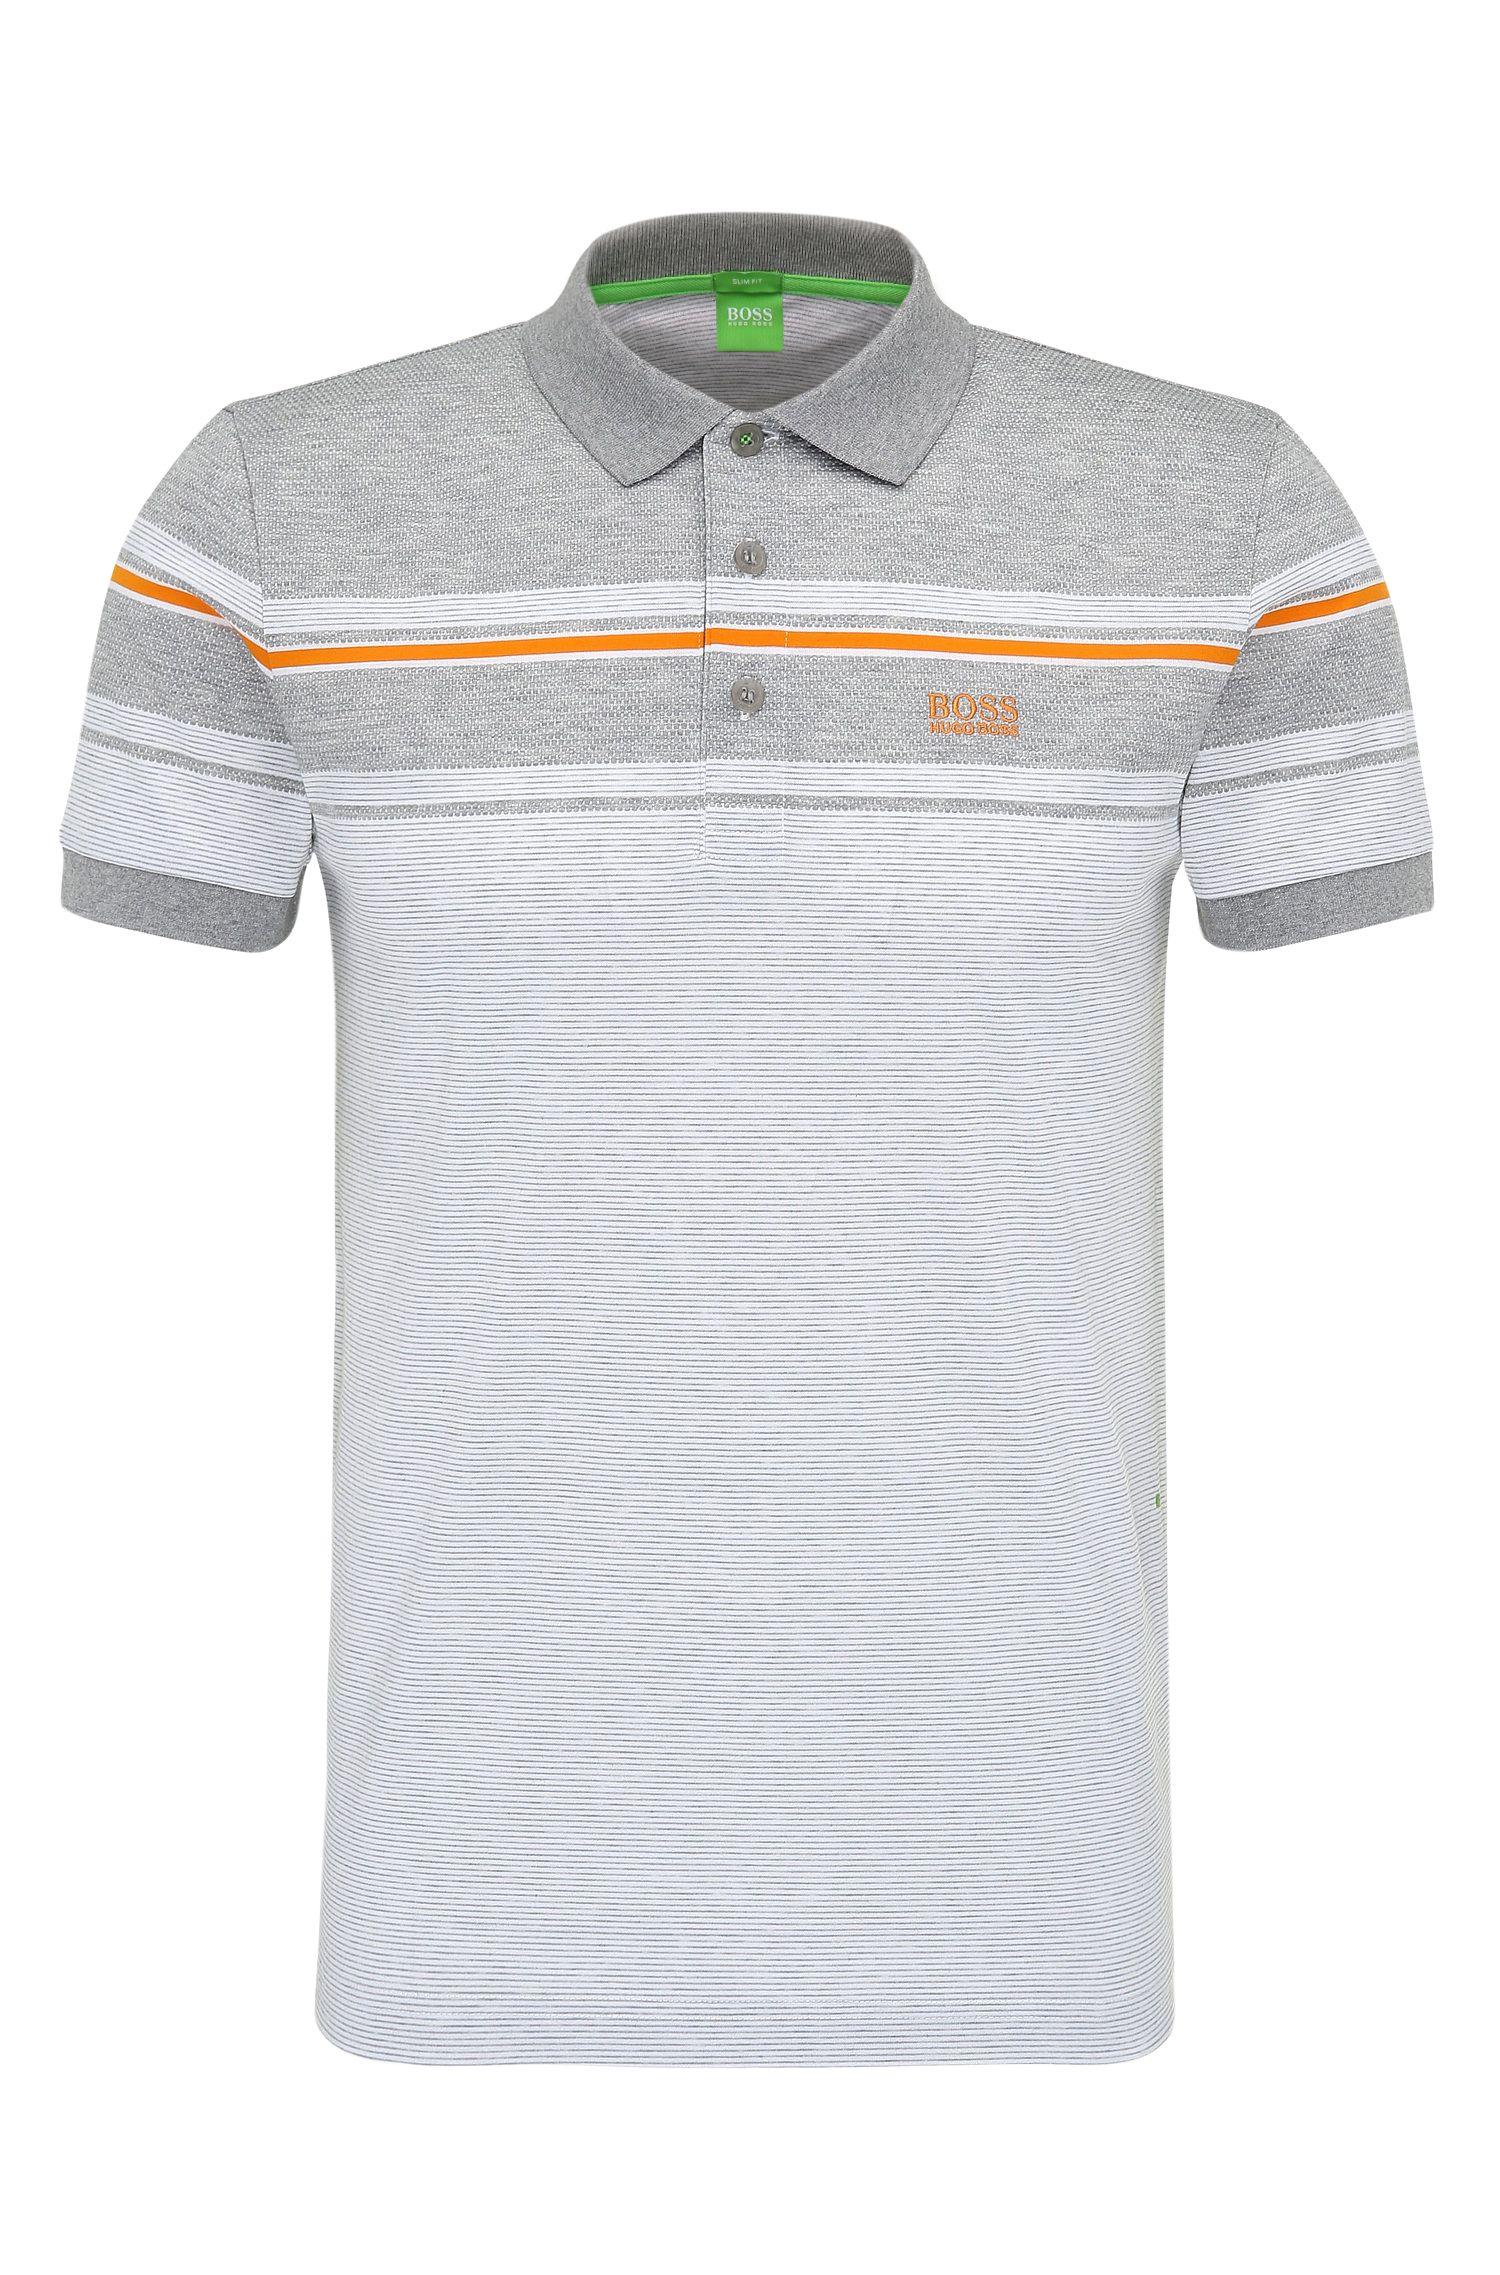 'Paule' | Slim Fit, Striped Cotton Polo Shirt